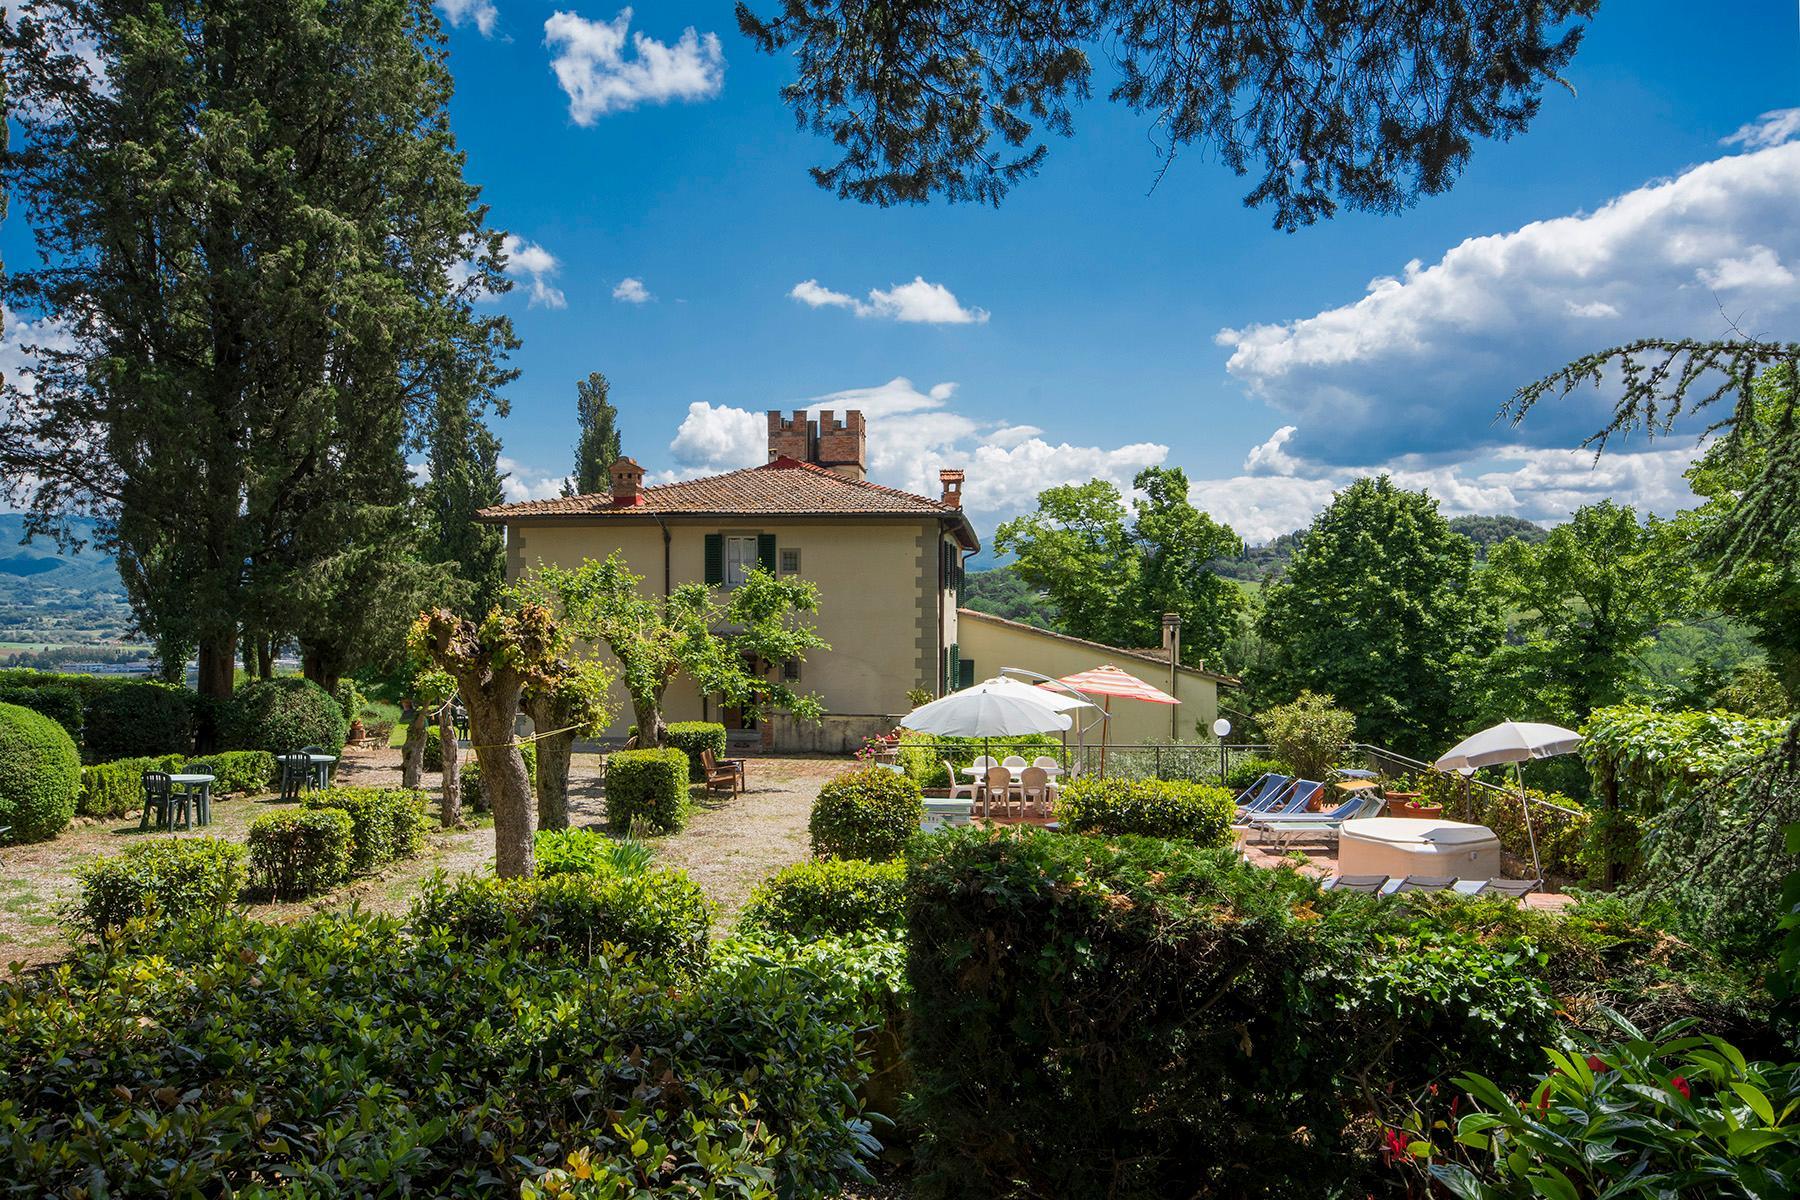 Villa charmante dans dans la Val di Sieve - 8